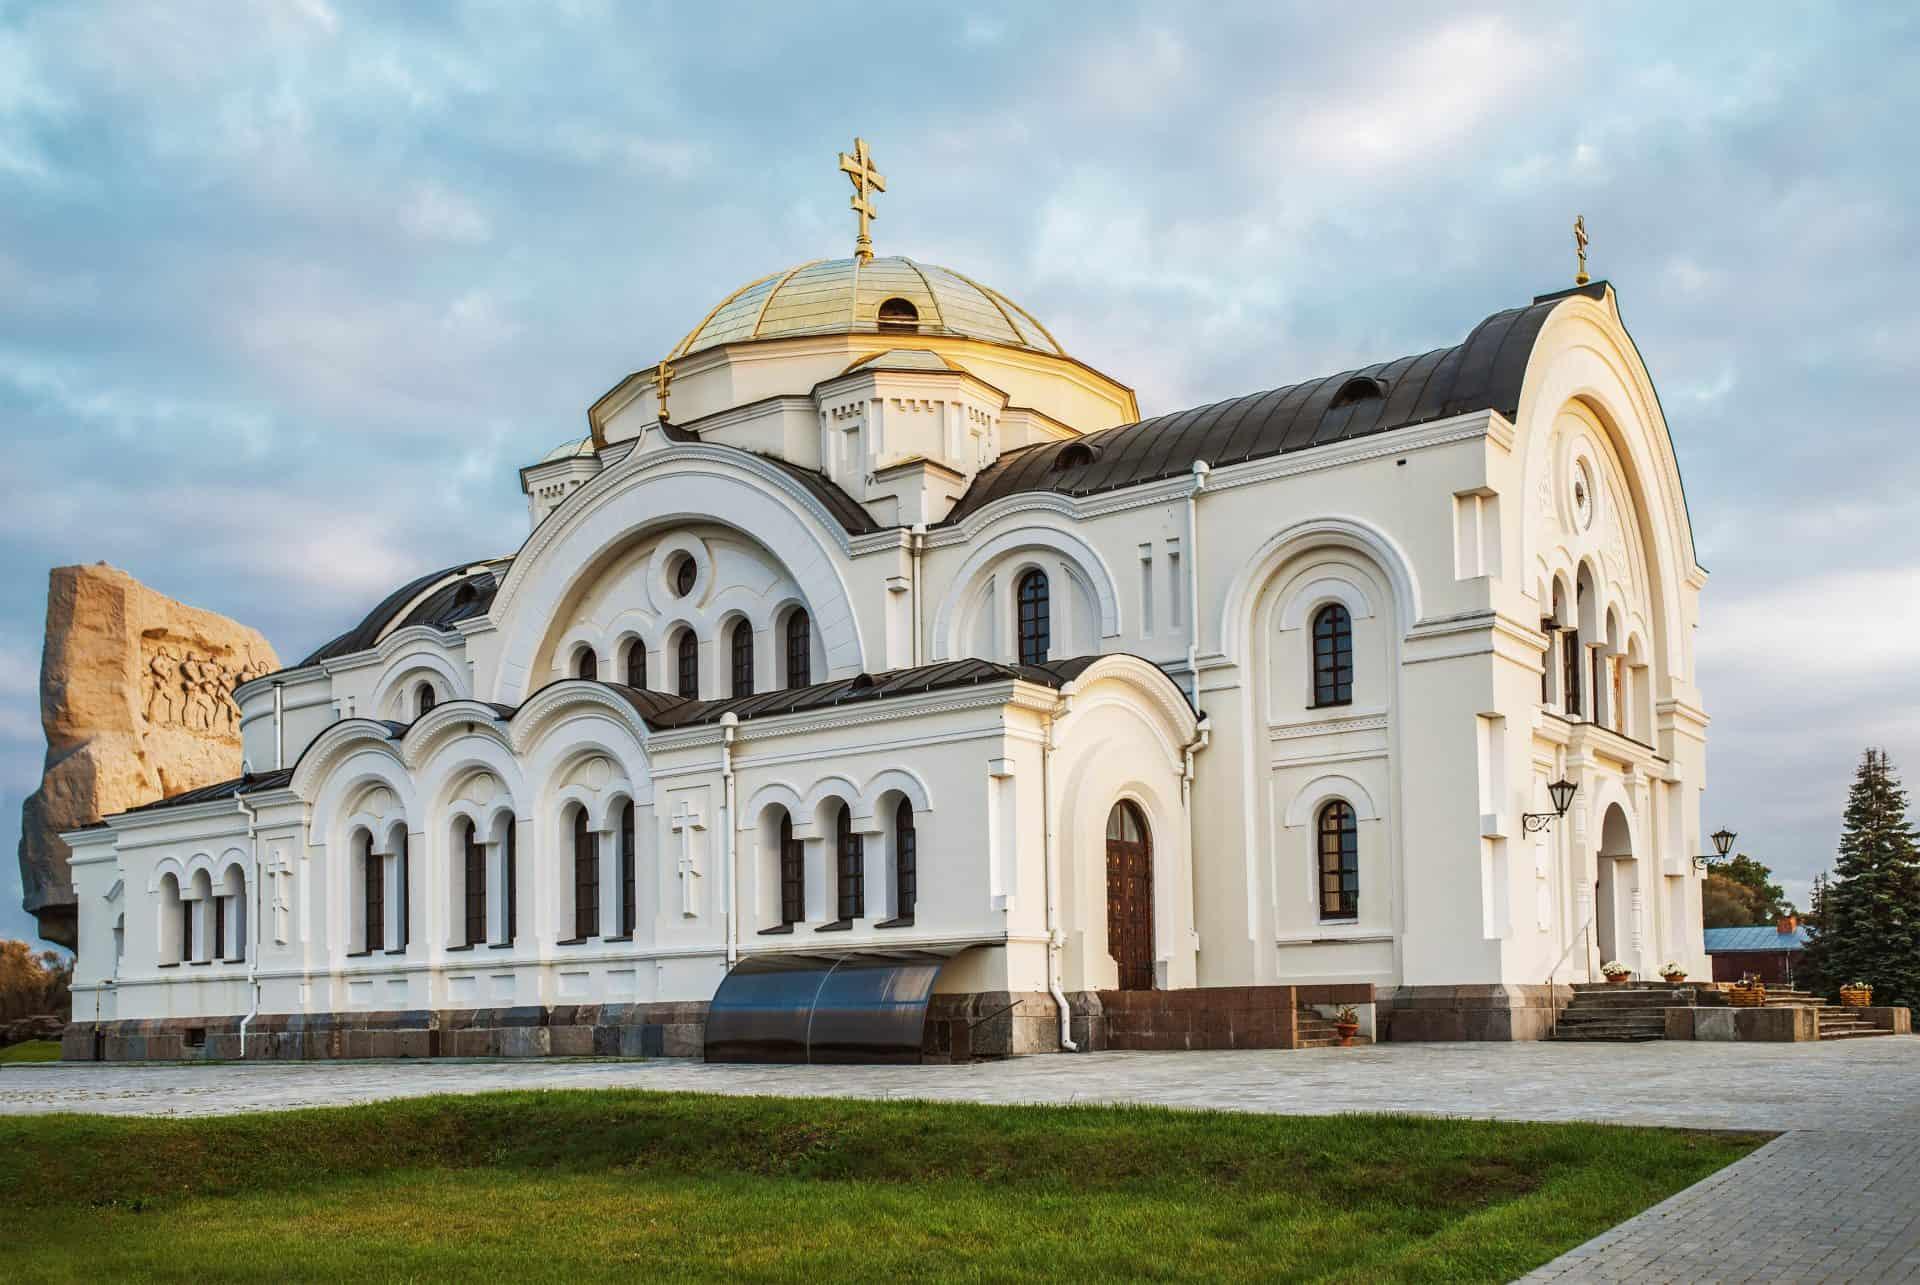 St. Nicholas Church in Brest Fortress